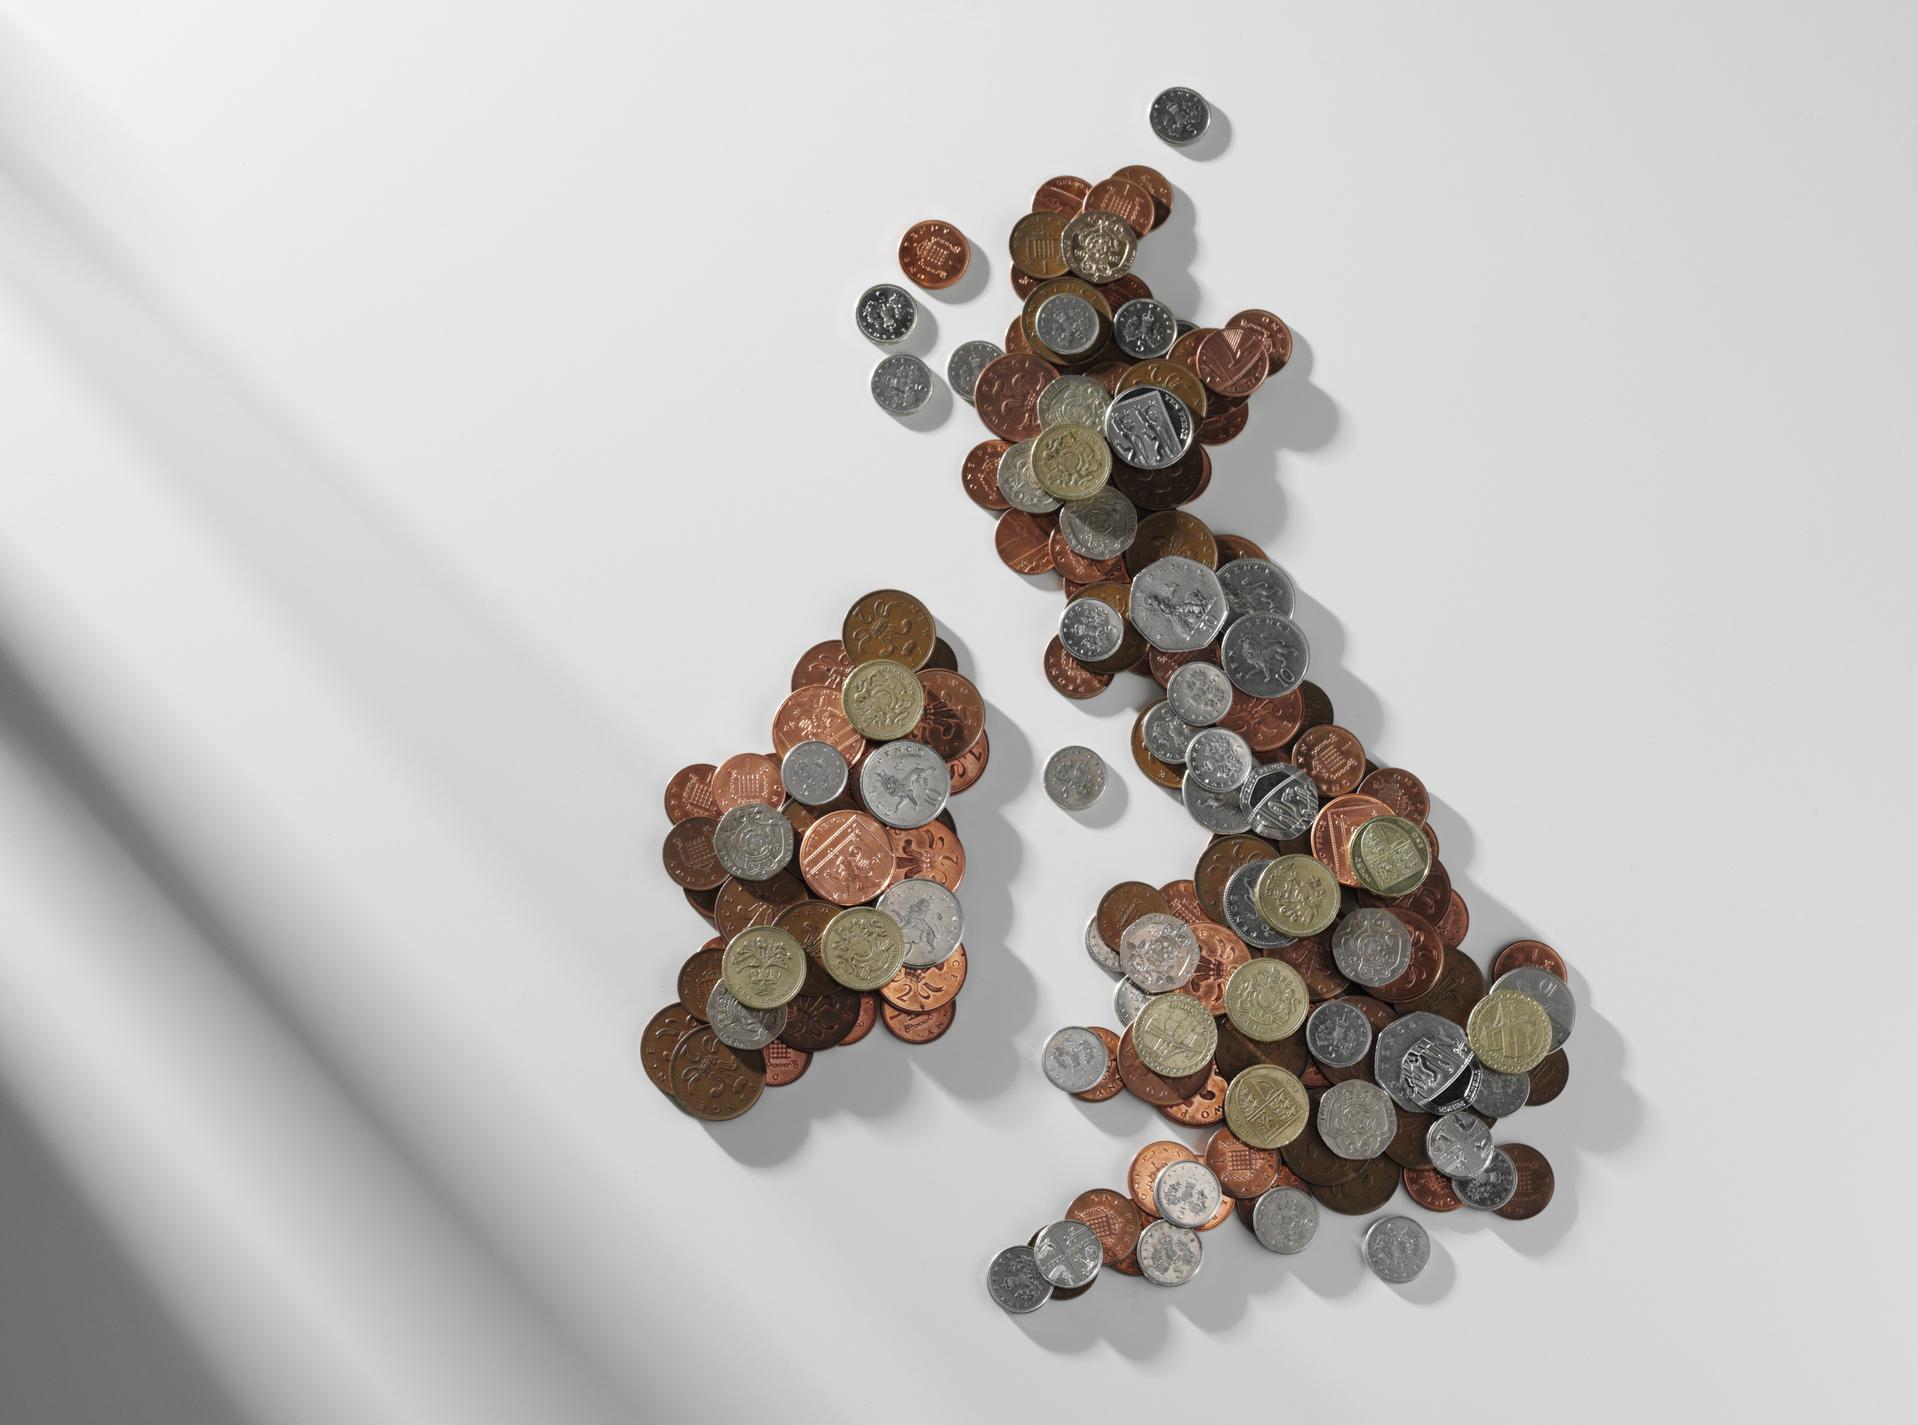 pound sterling money UK